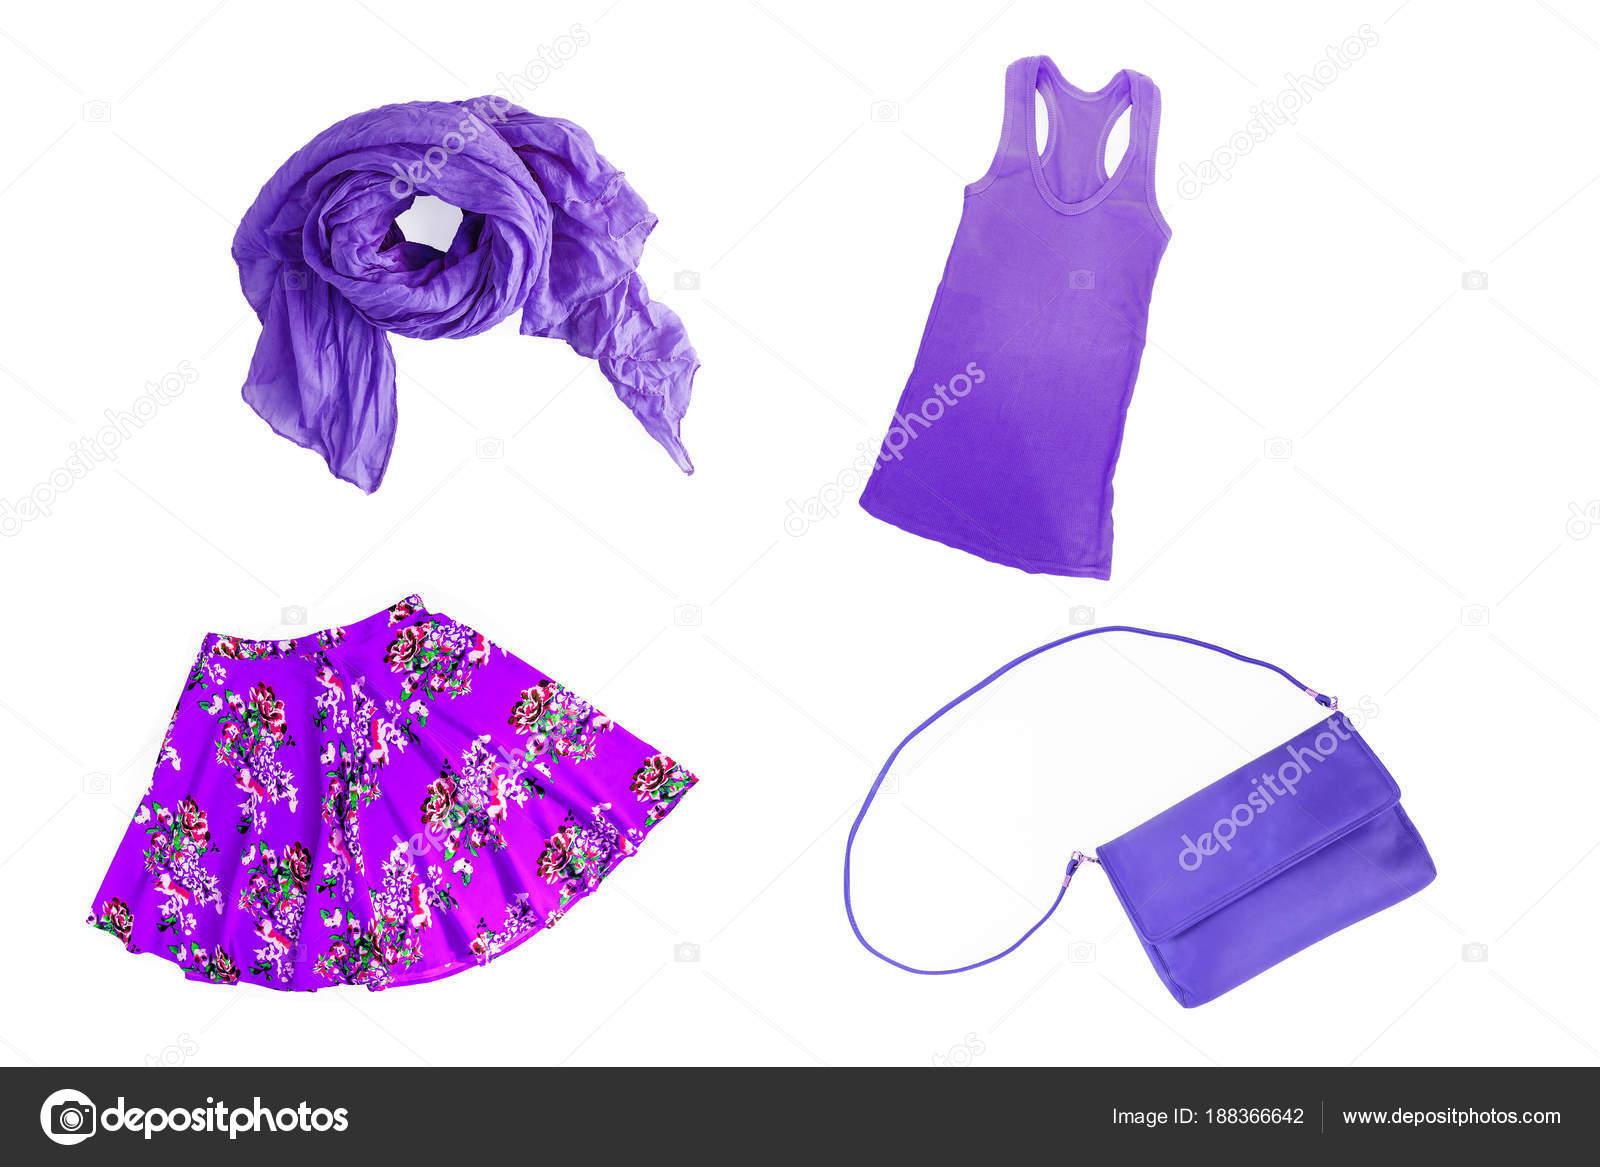 3605fb9f42e κολάζ της μόδας άνοιξη-καλοκαίρι λιλά-λιλά-μωβ γυναικεία c ...